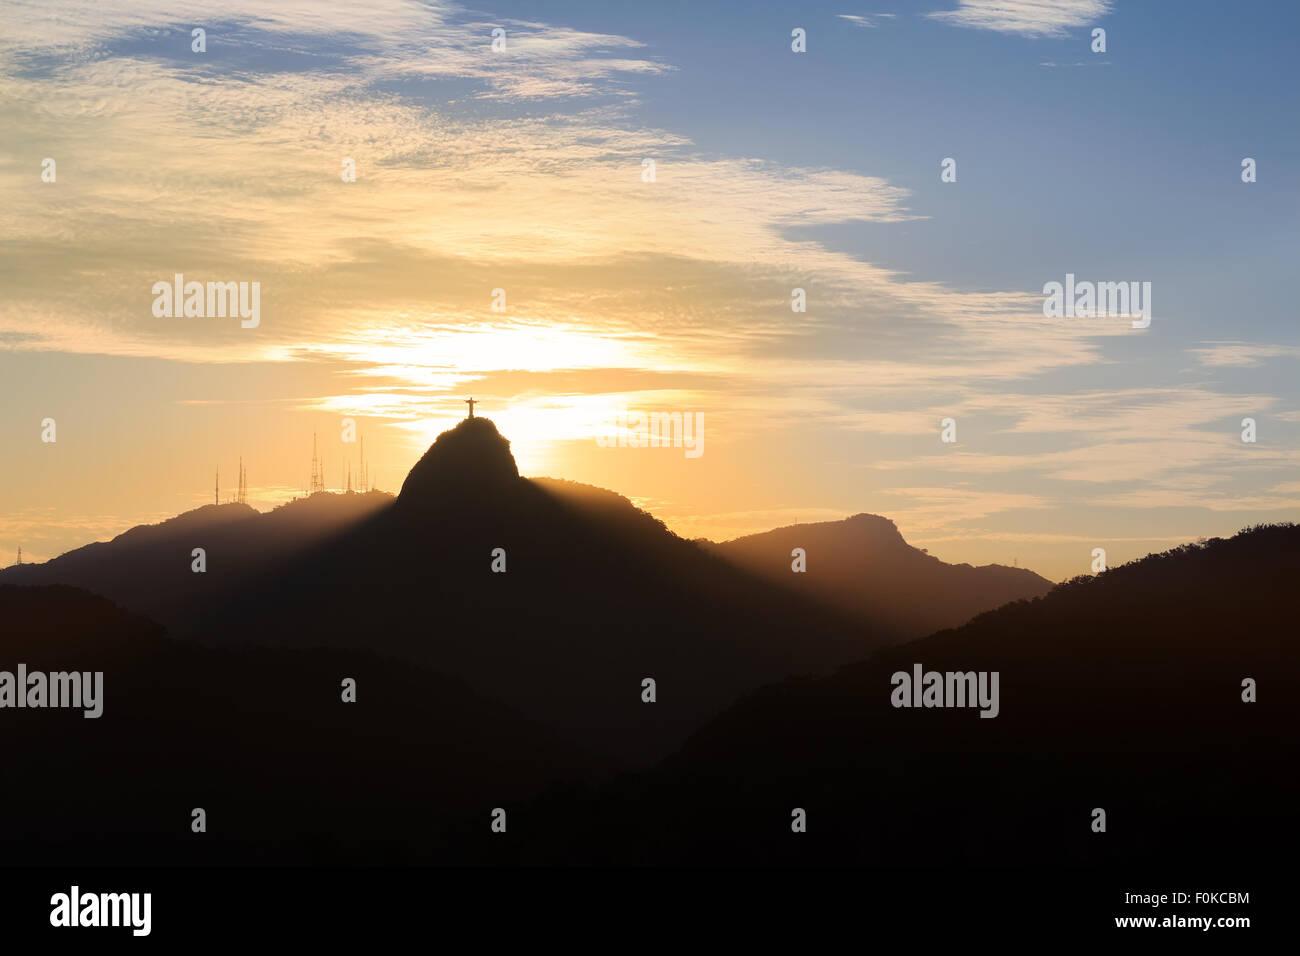 Sun light behind Mountain Corcovado Christ the Redeemer, sunset, Rio de Janeiro, Brazil Stock Photo